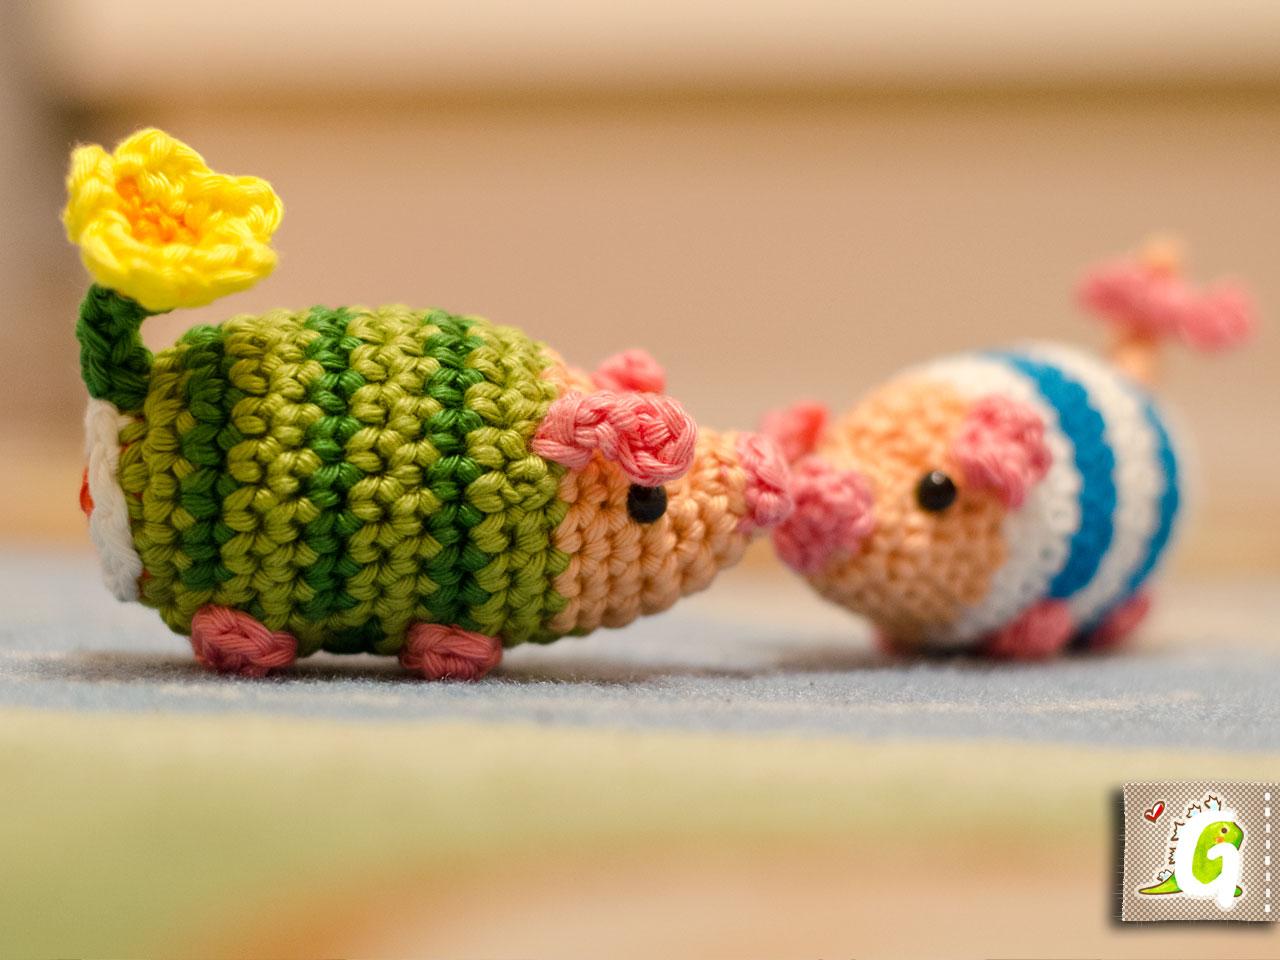 I make cute things - Rathalos from MH - diy post - Imgur | 960x1280